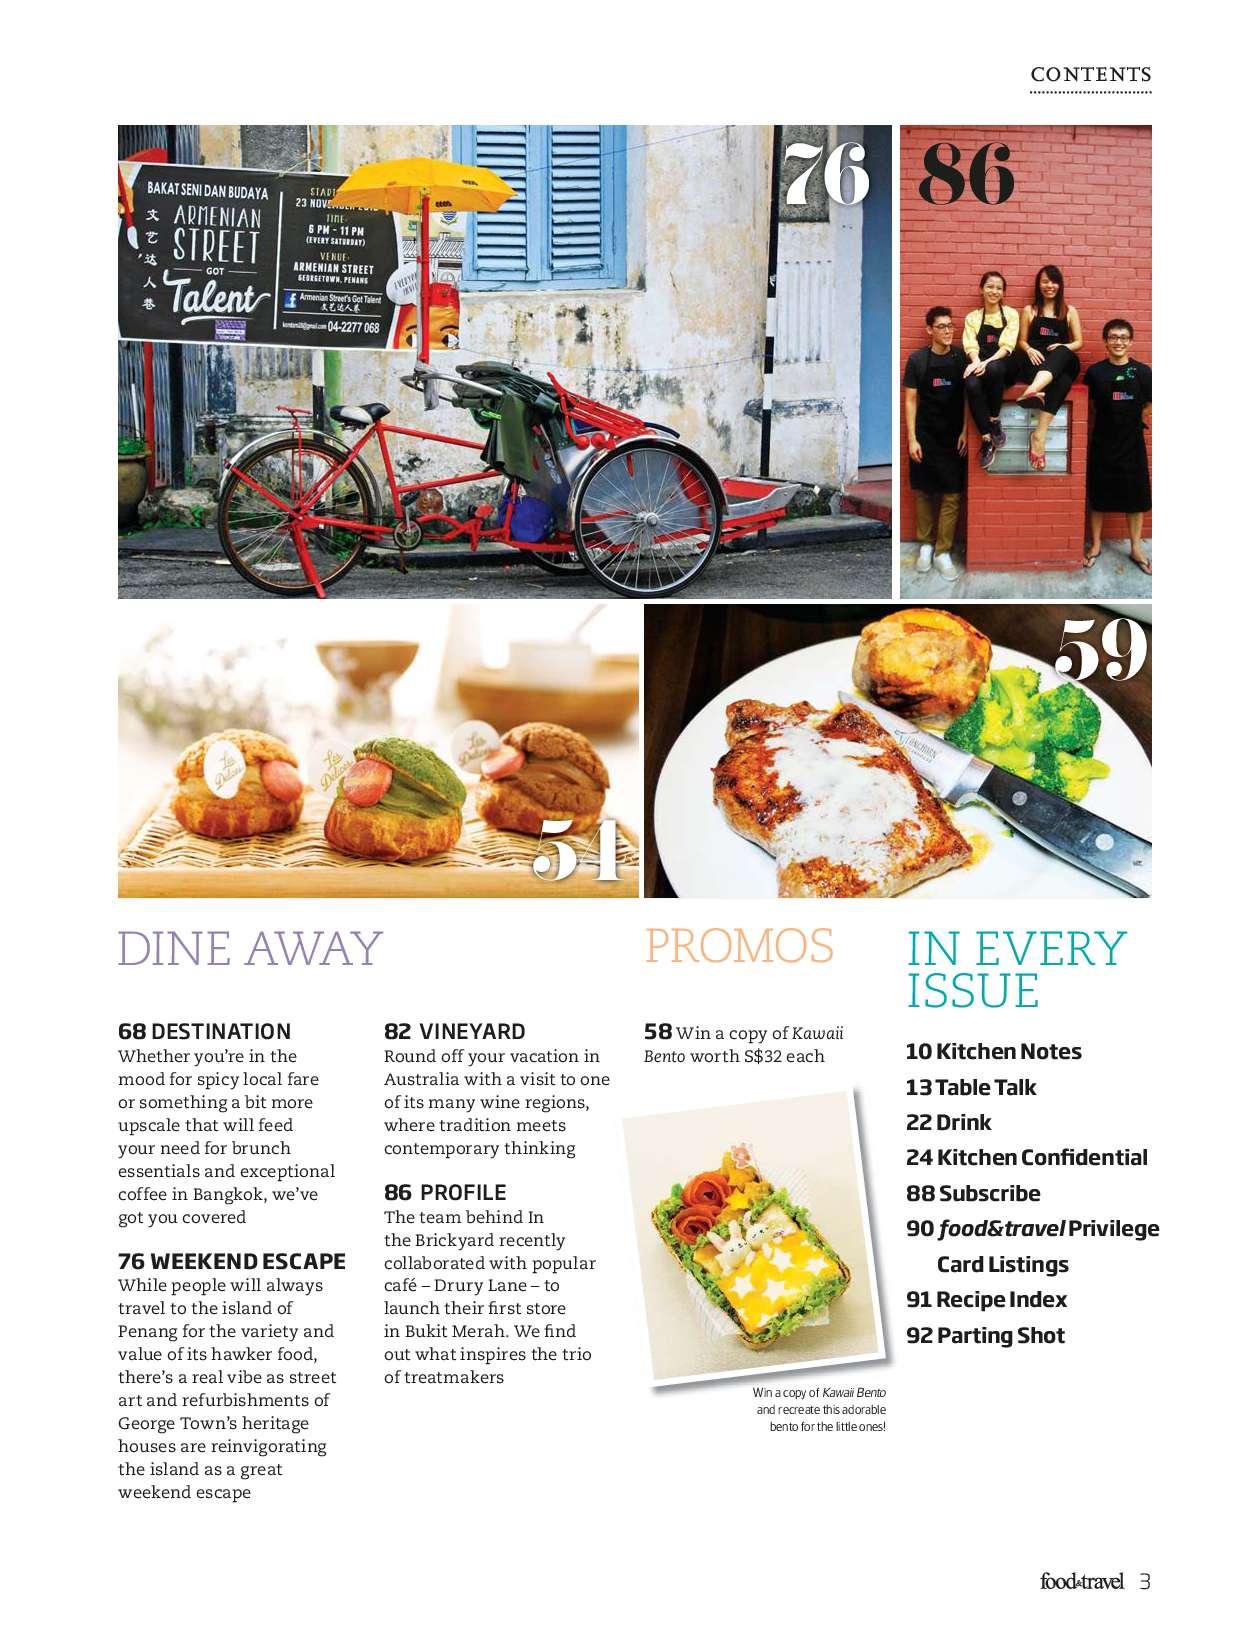 Food & Travel Magazine April 2015 - Gramedia Digital